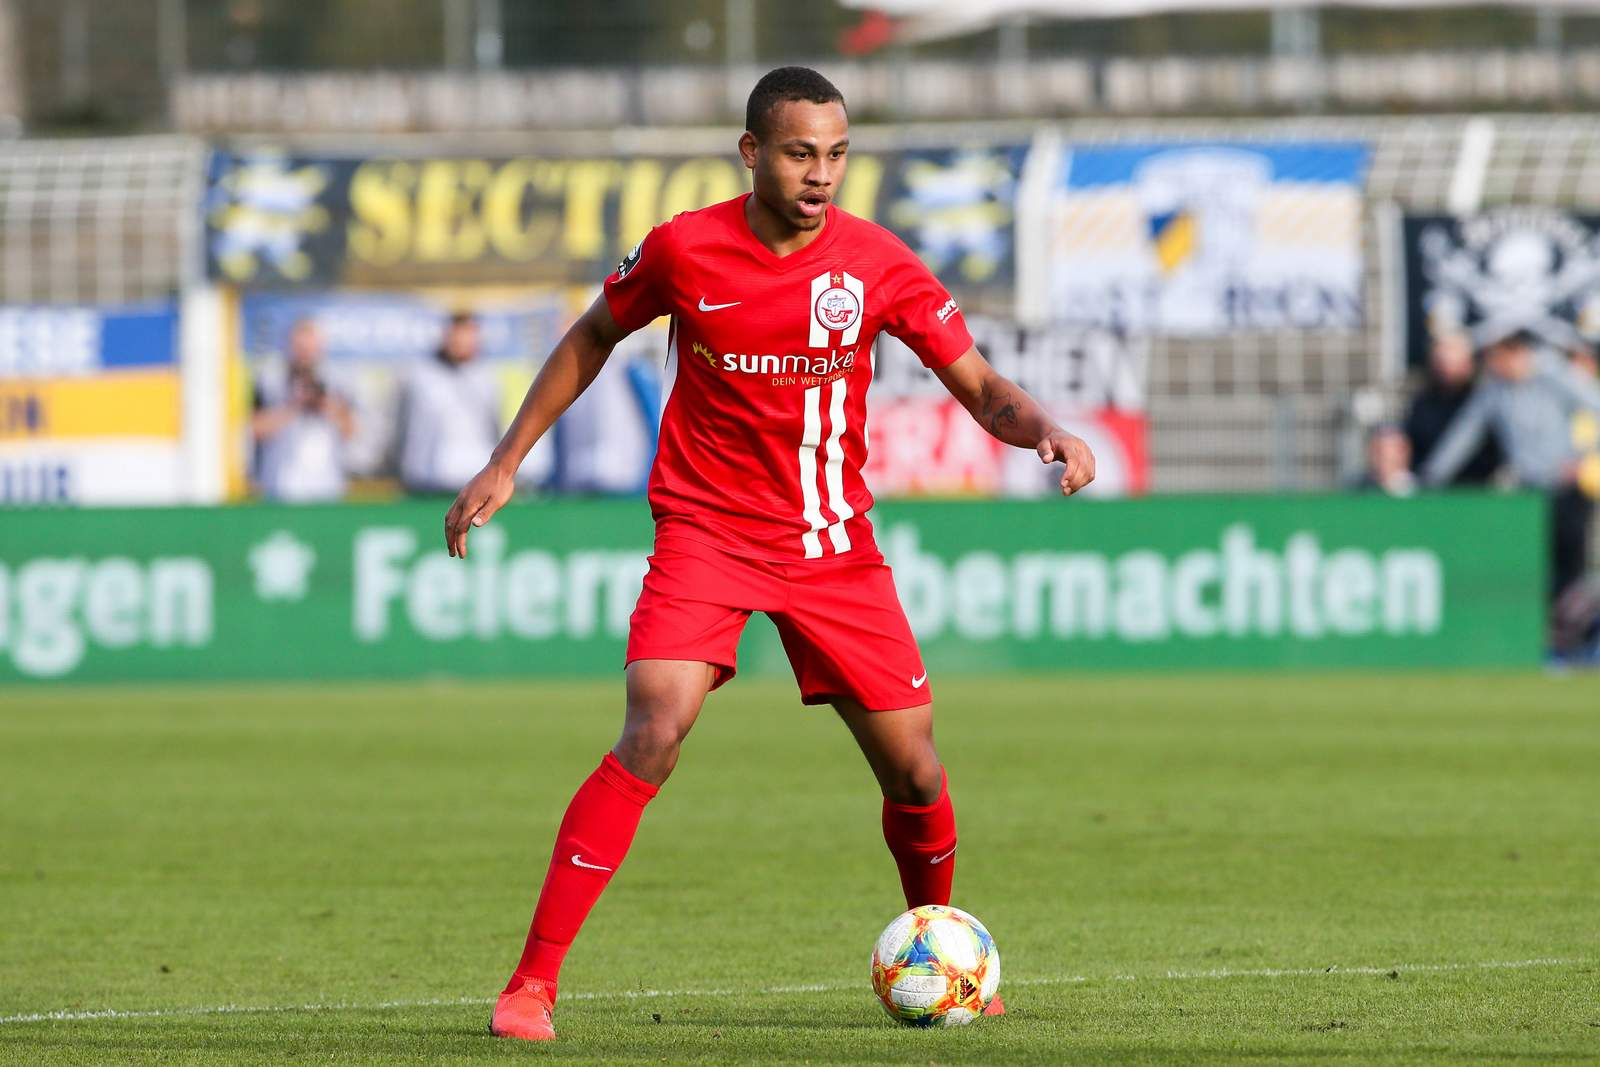 Nikolas Nartey am Ball bei Hansa Rostock